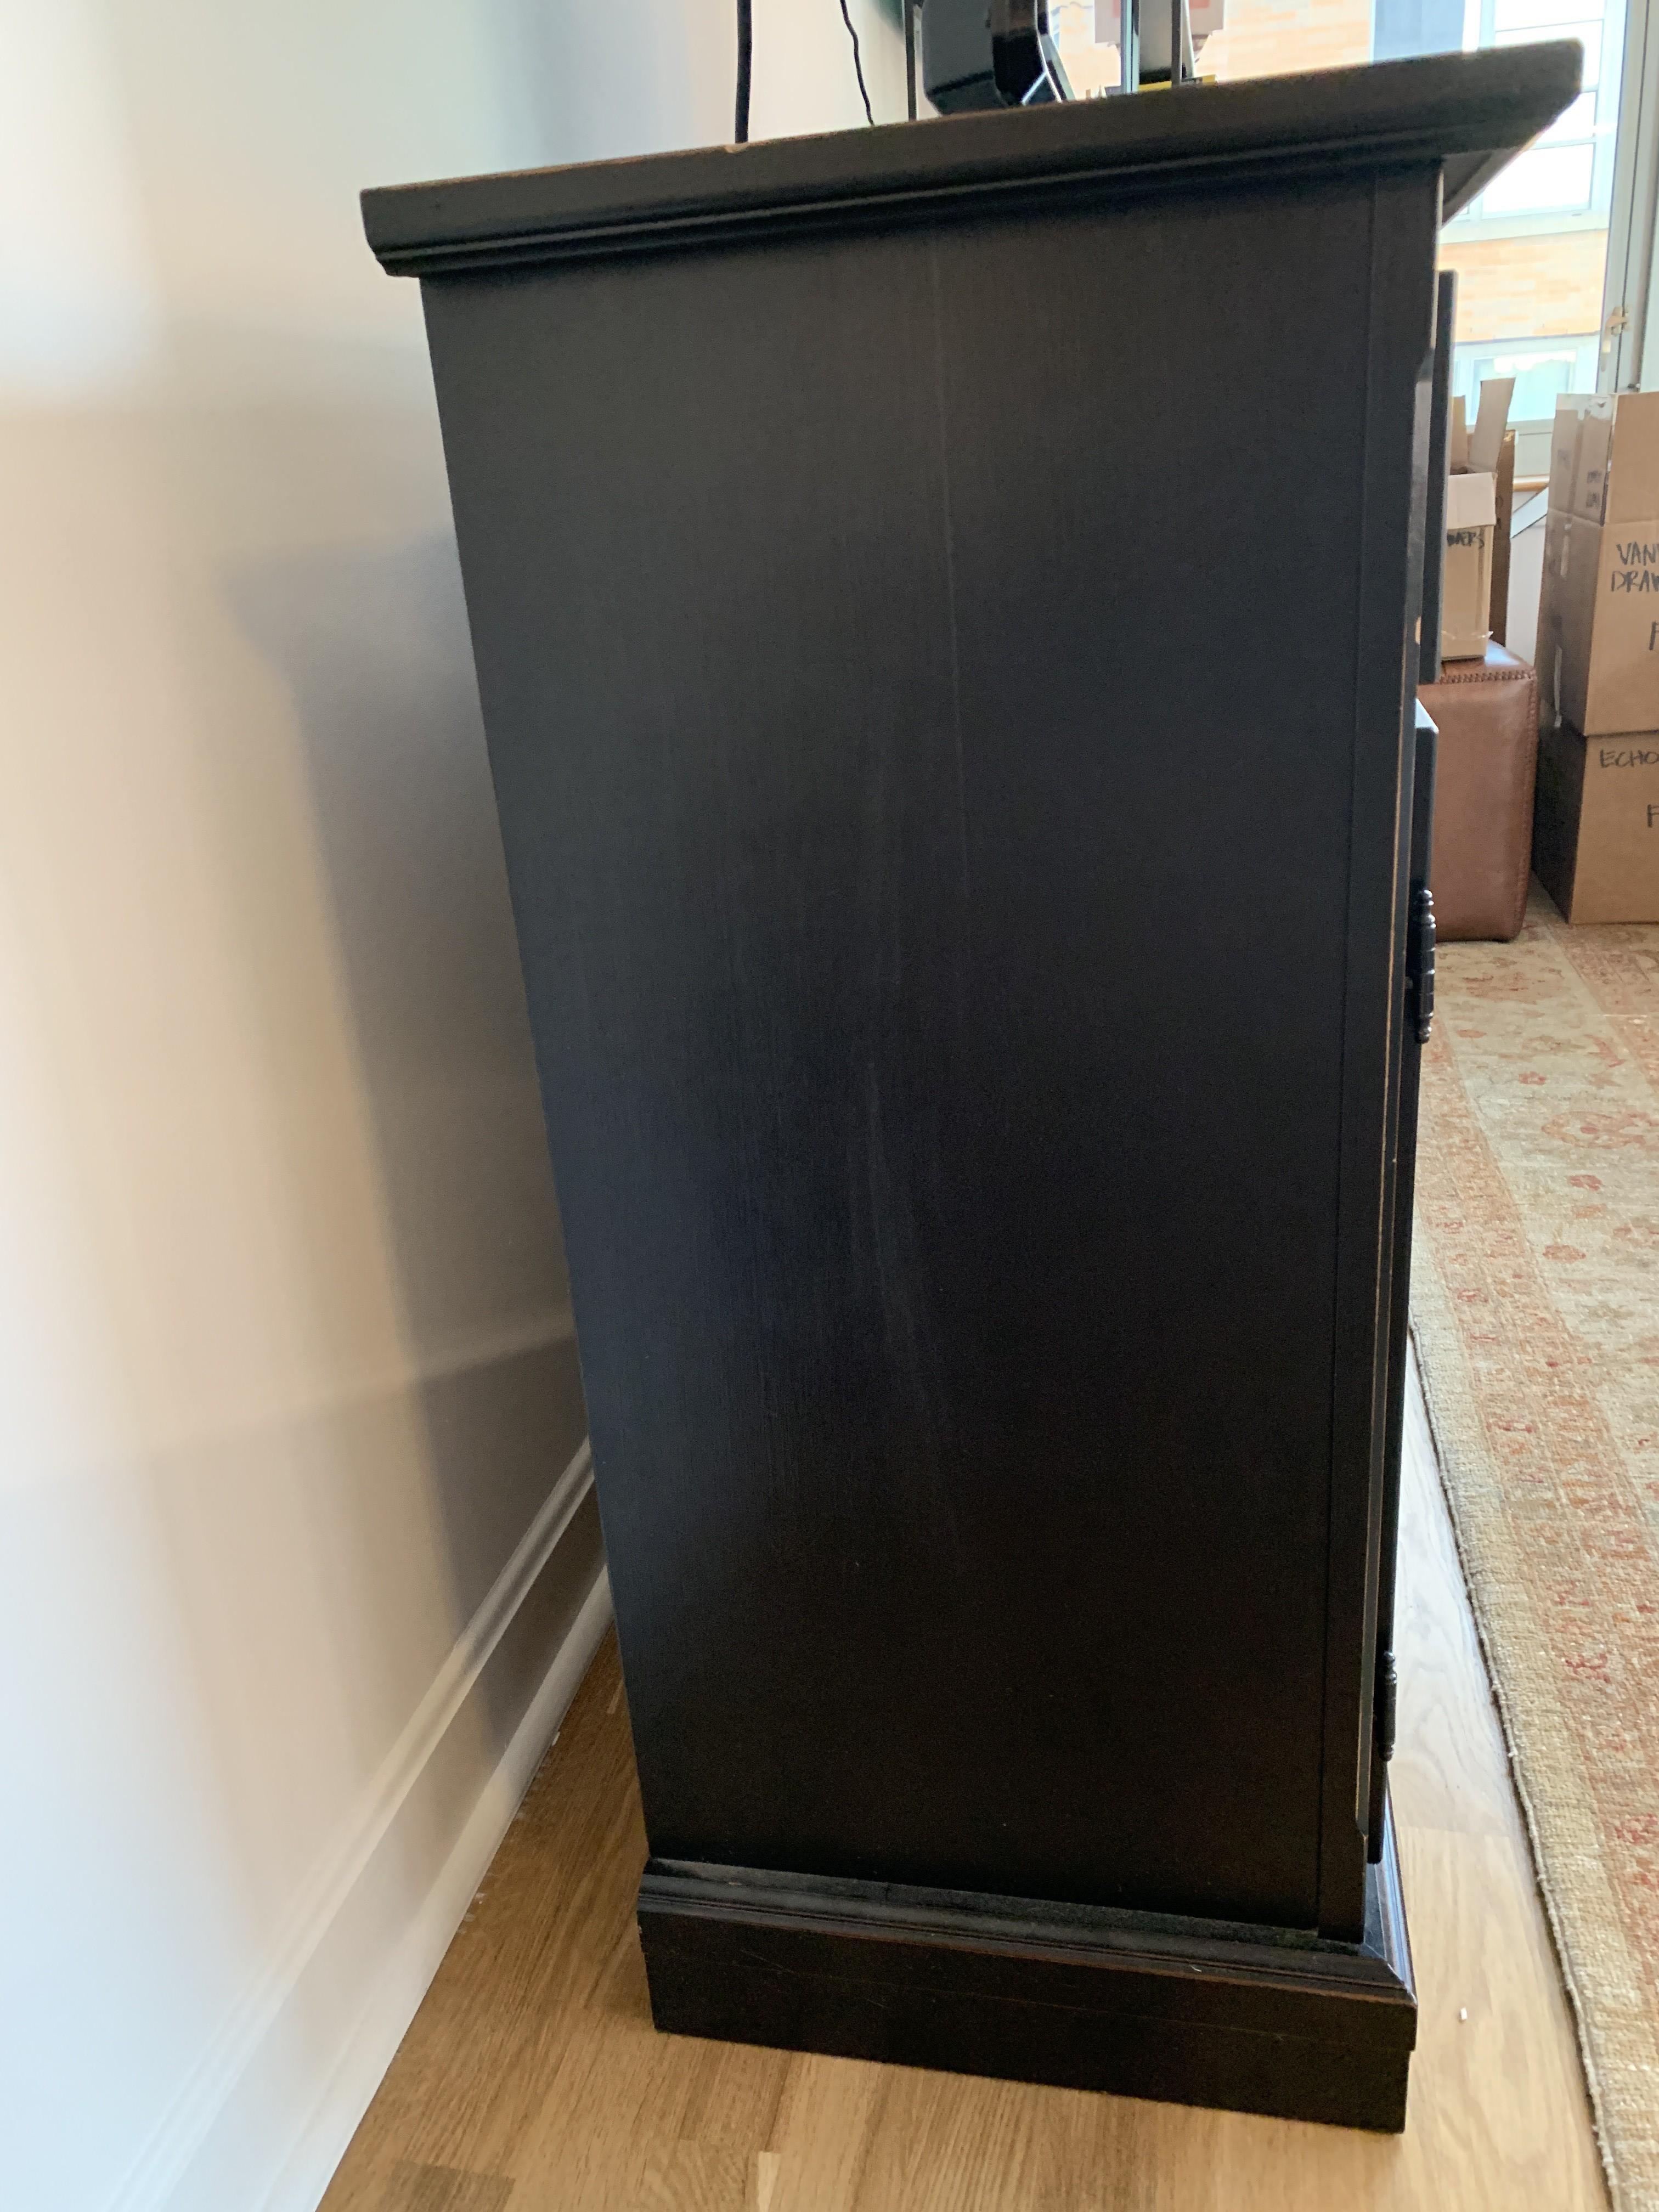 Crate & Barrel Pranzo II Black Sideboard